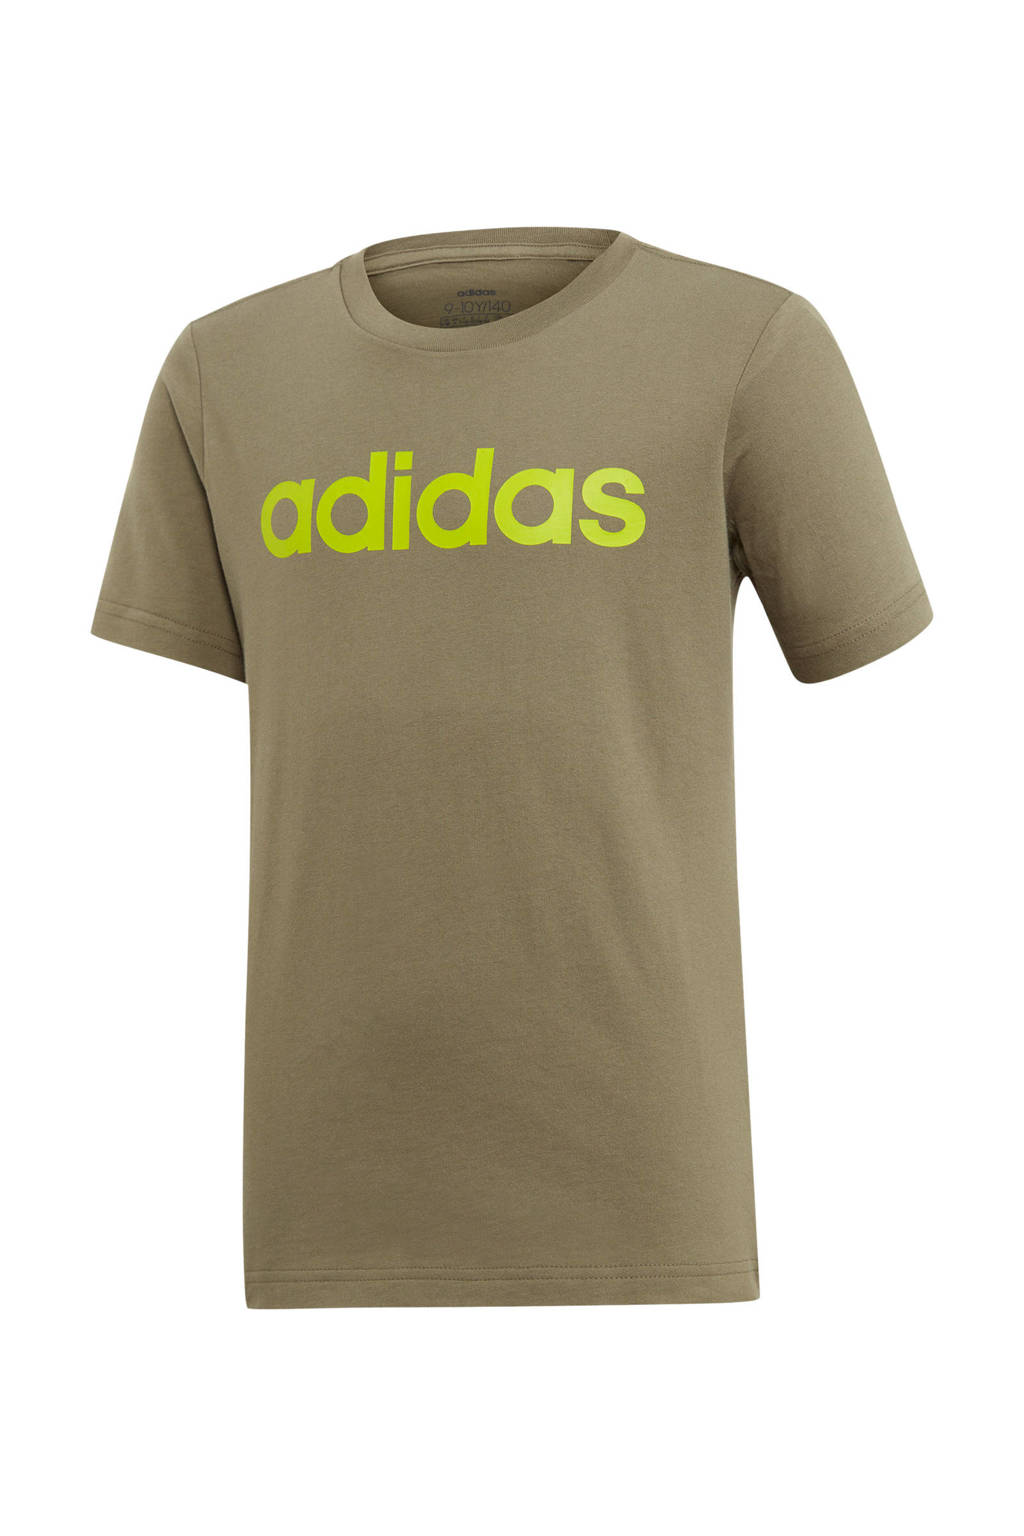 adidas Performance   sport T-shirt olijfgroen/limegroen, Olijfgroen/limegroen